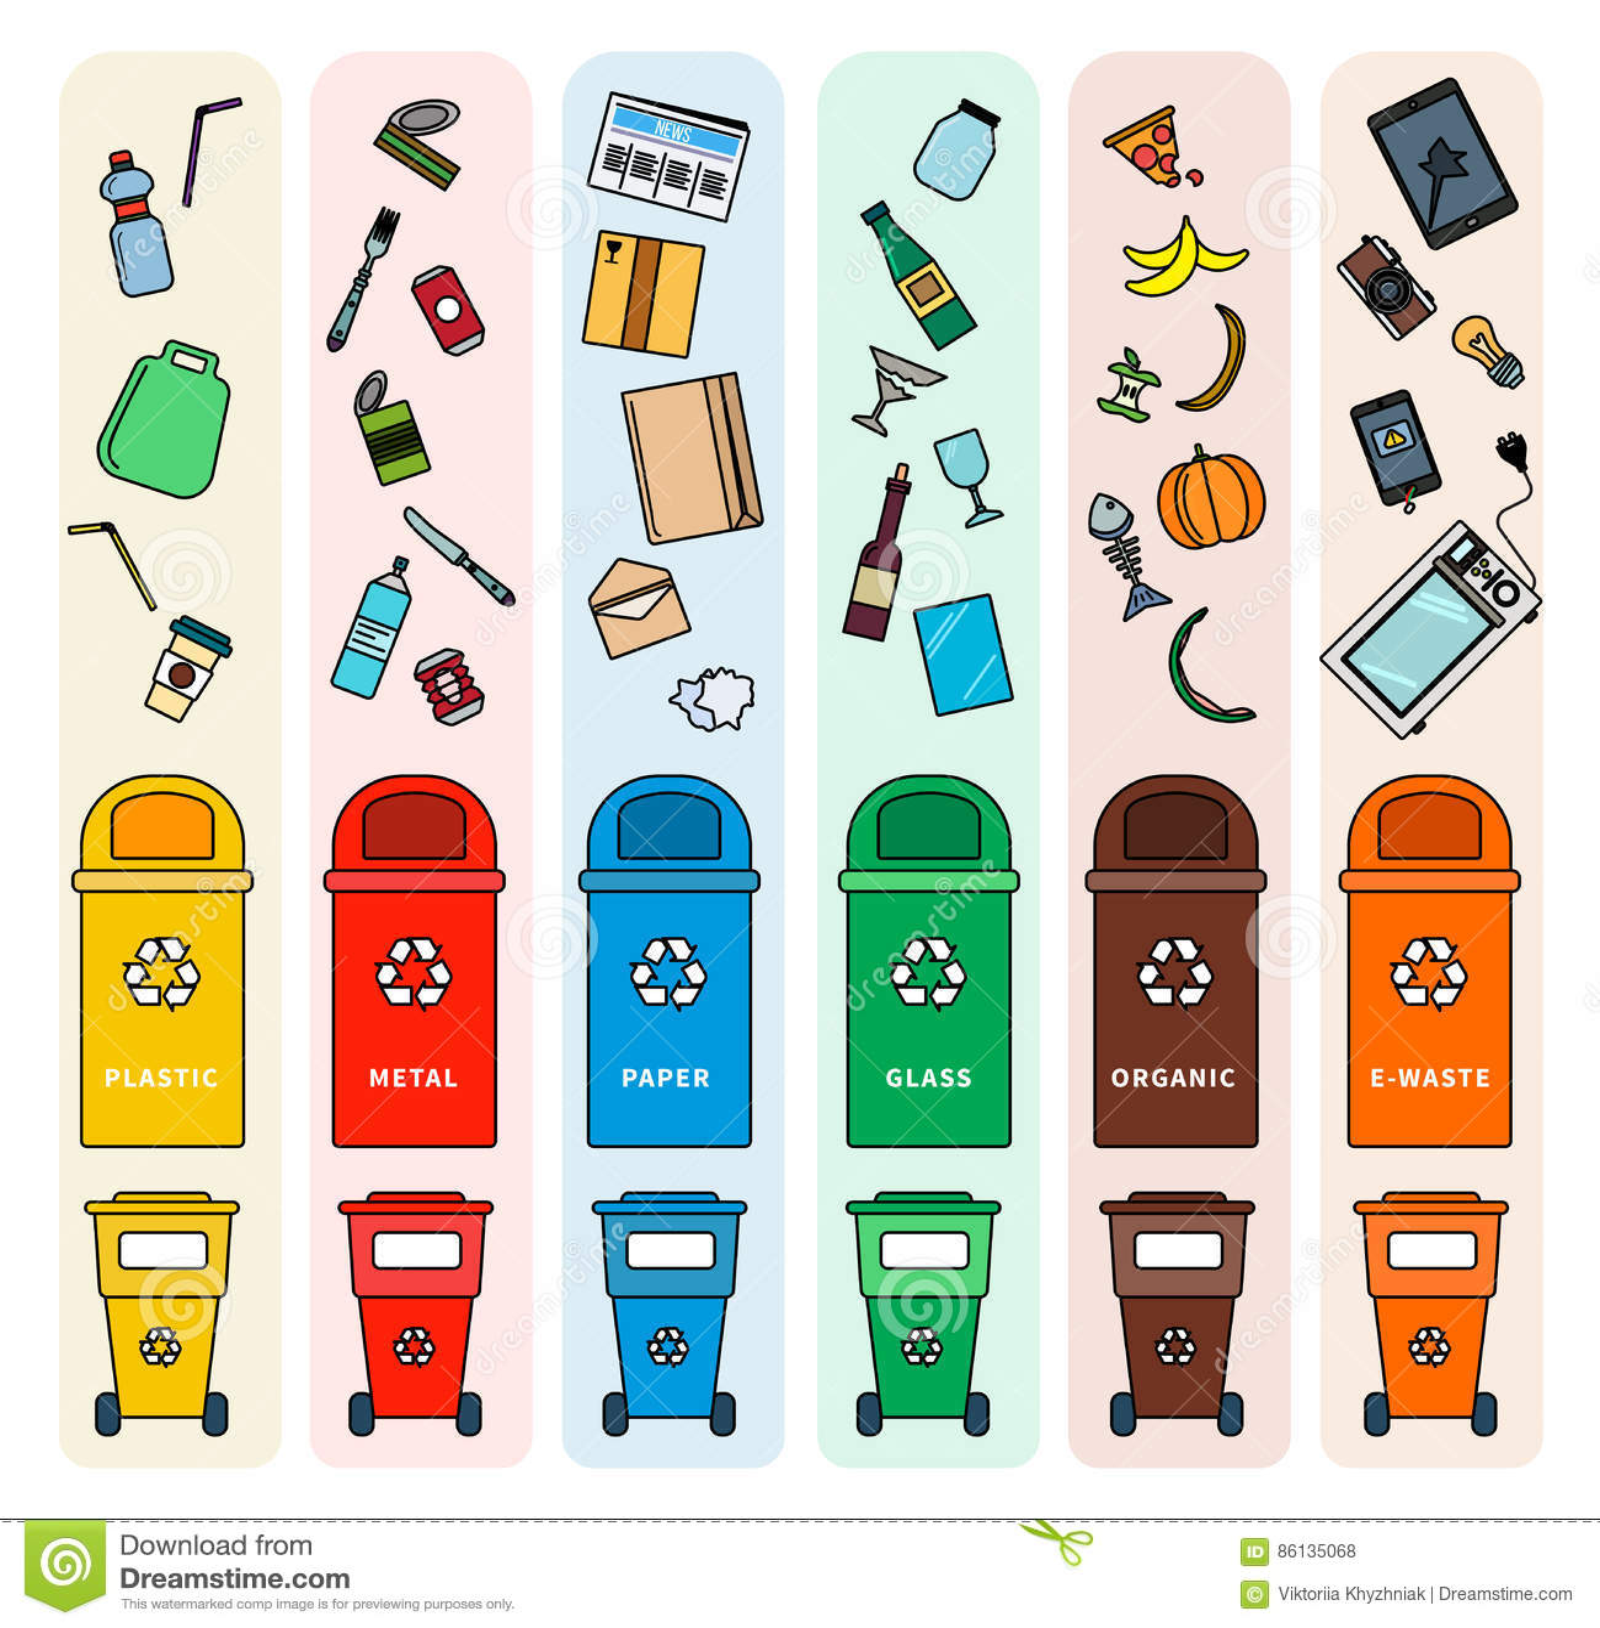 Sorting Garbage Bins Vector Illustration